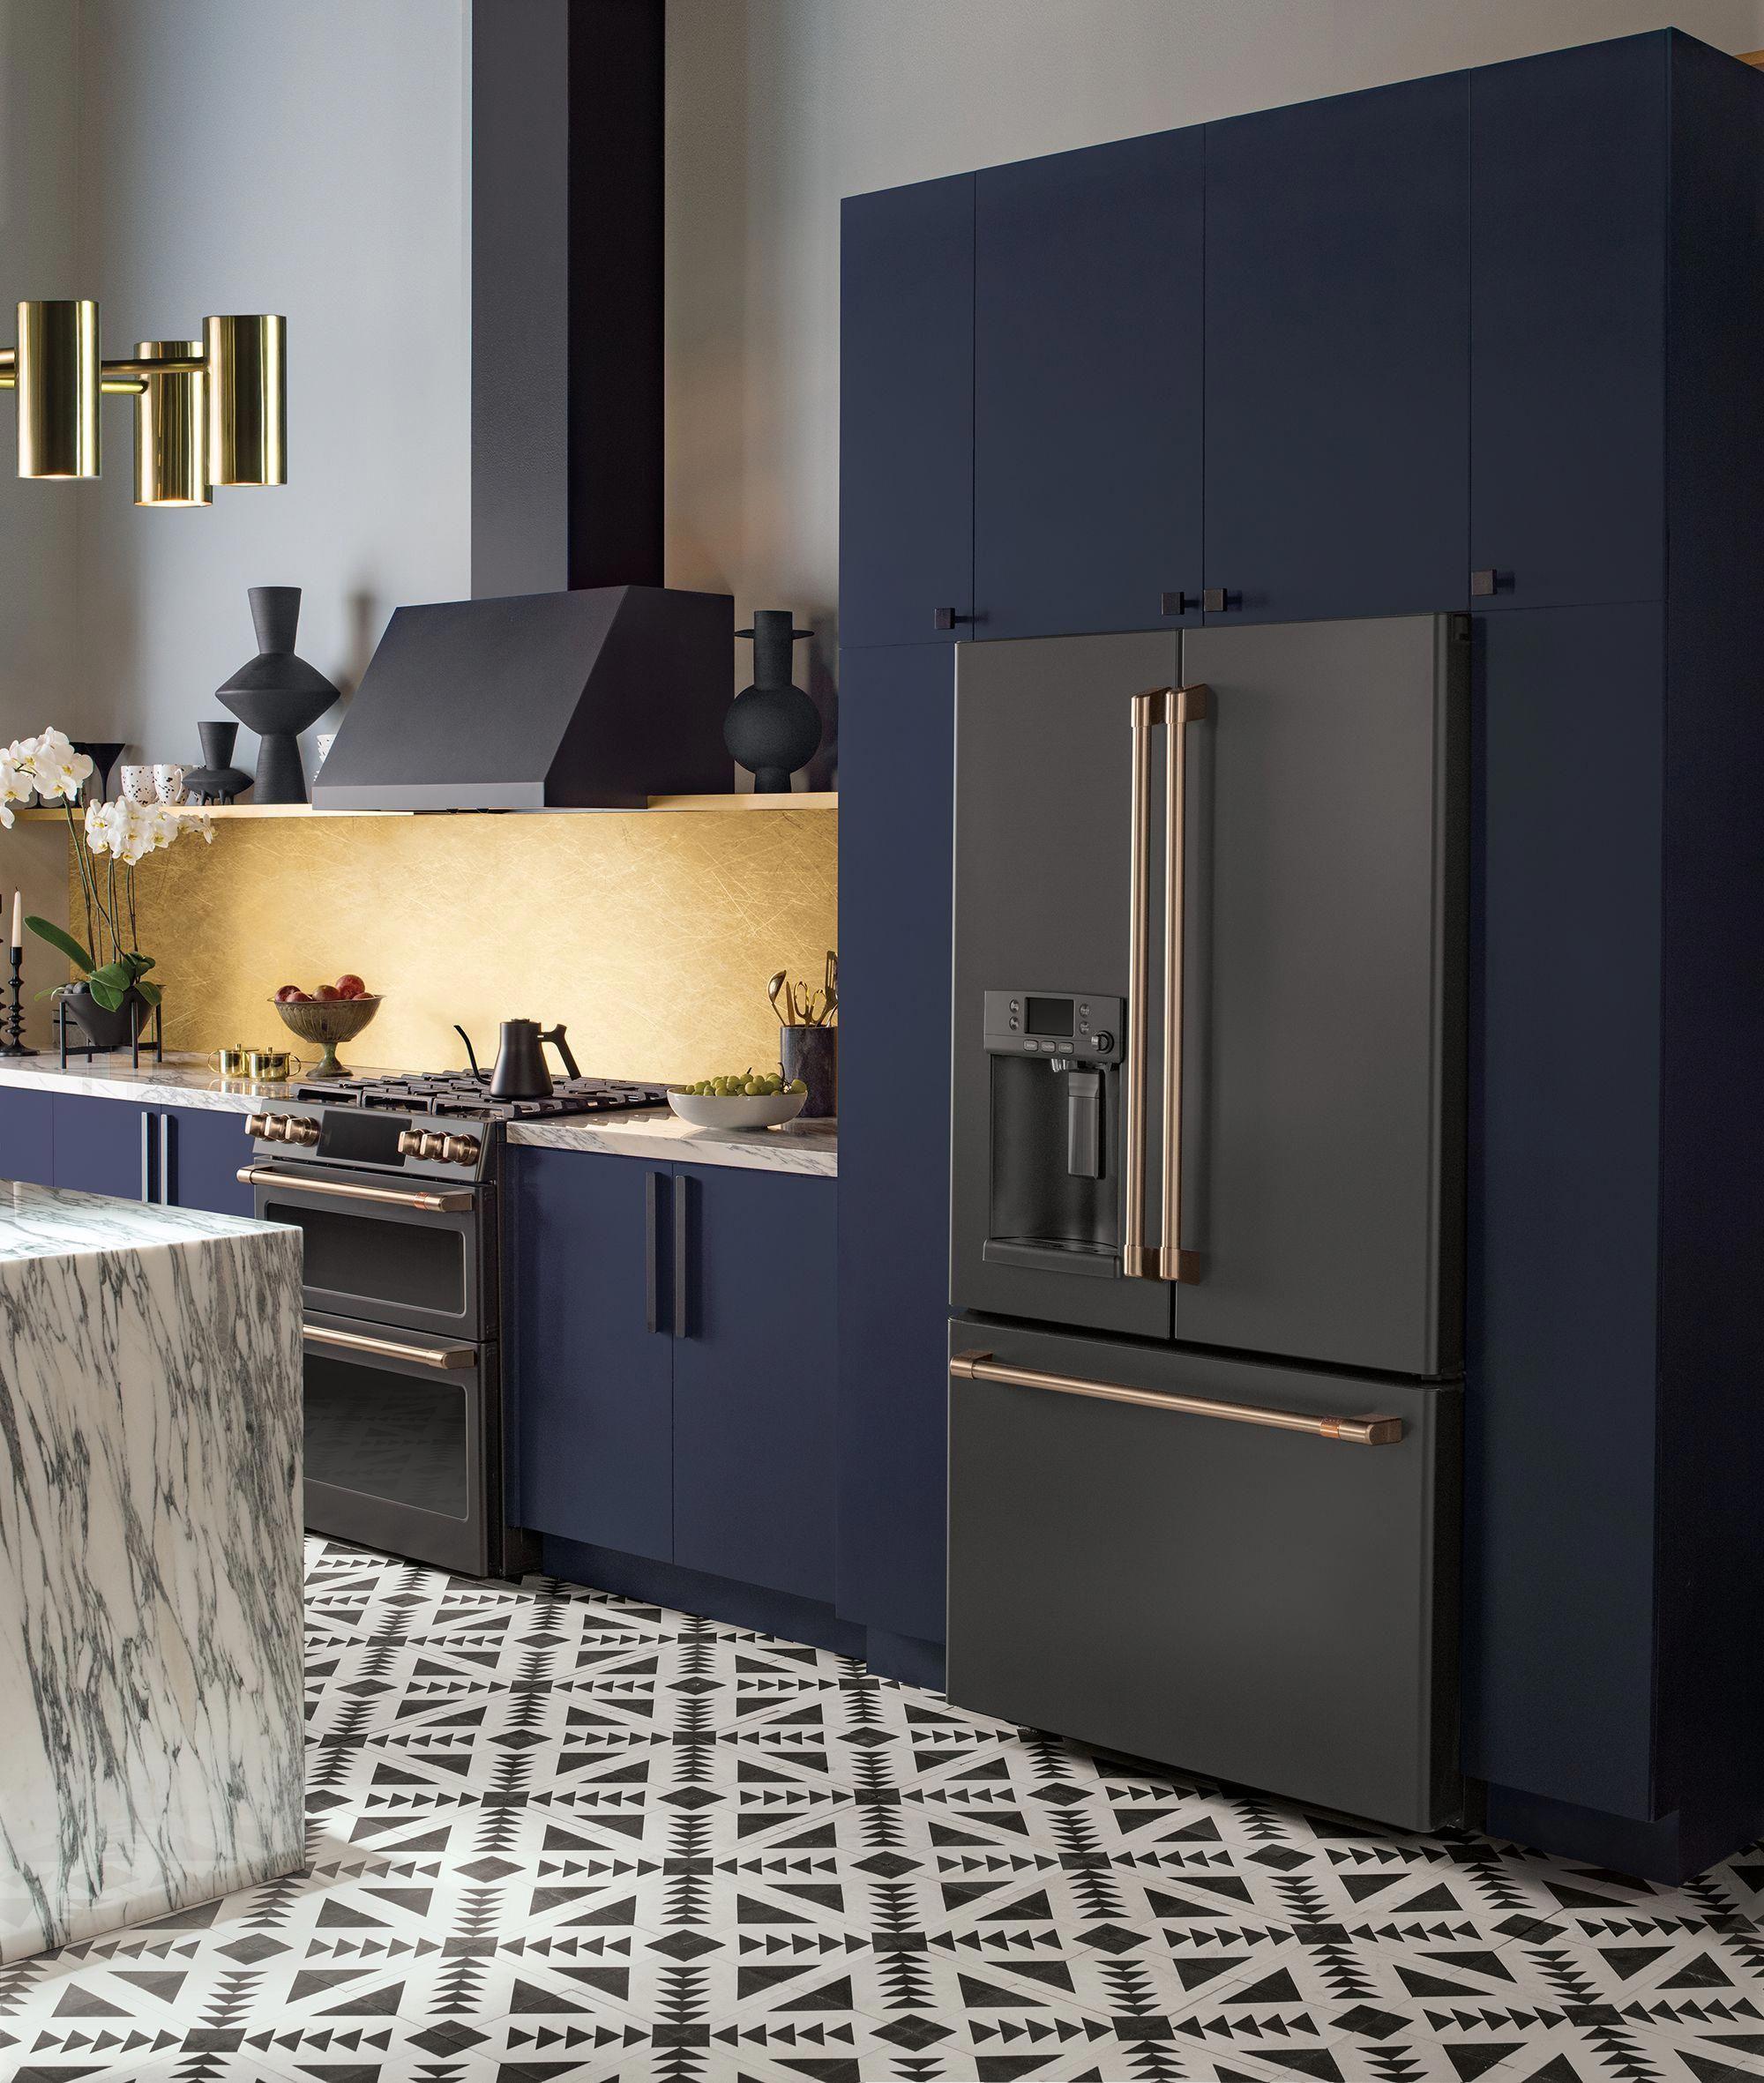 Luxury modern kitchen with midnight blue and